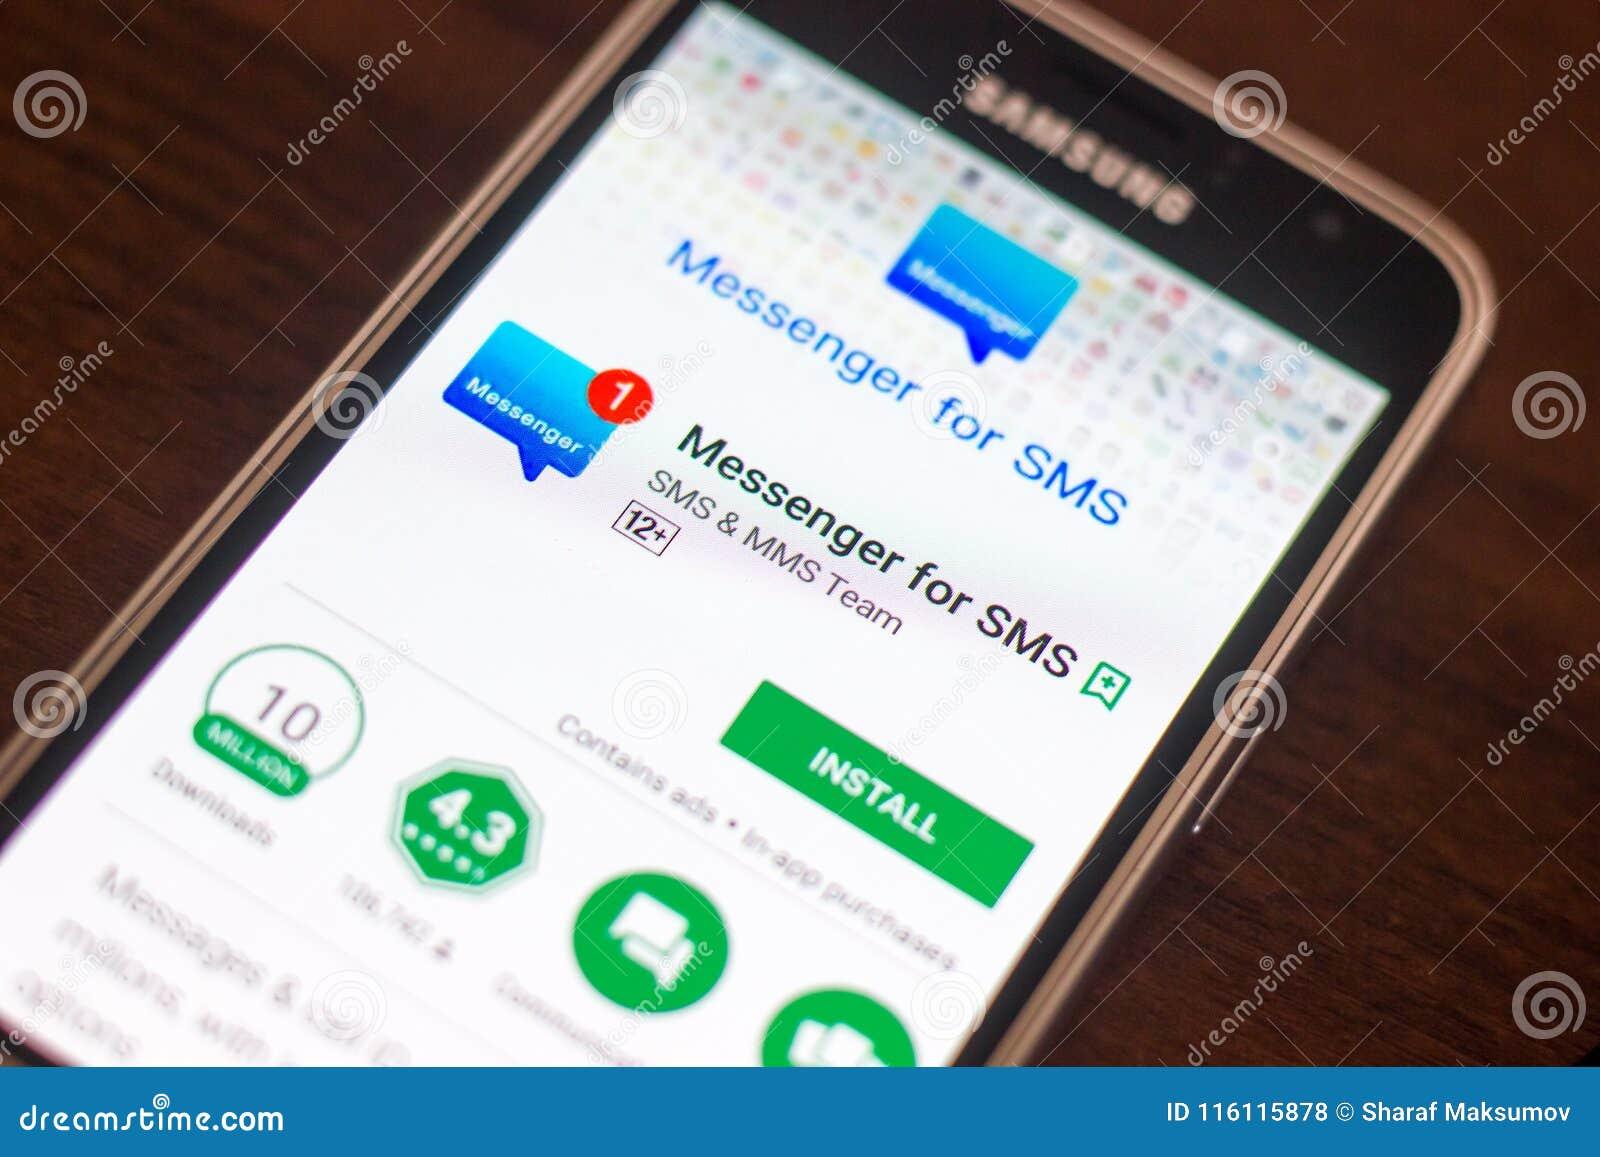 online sms app for mobile